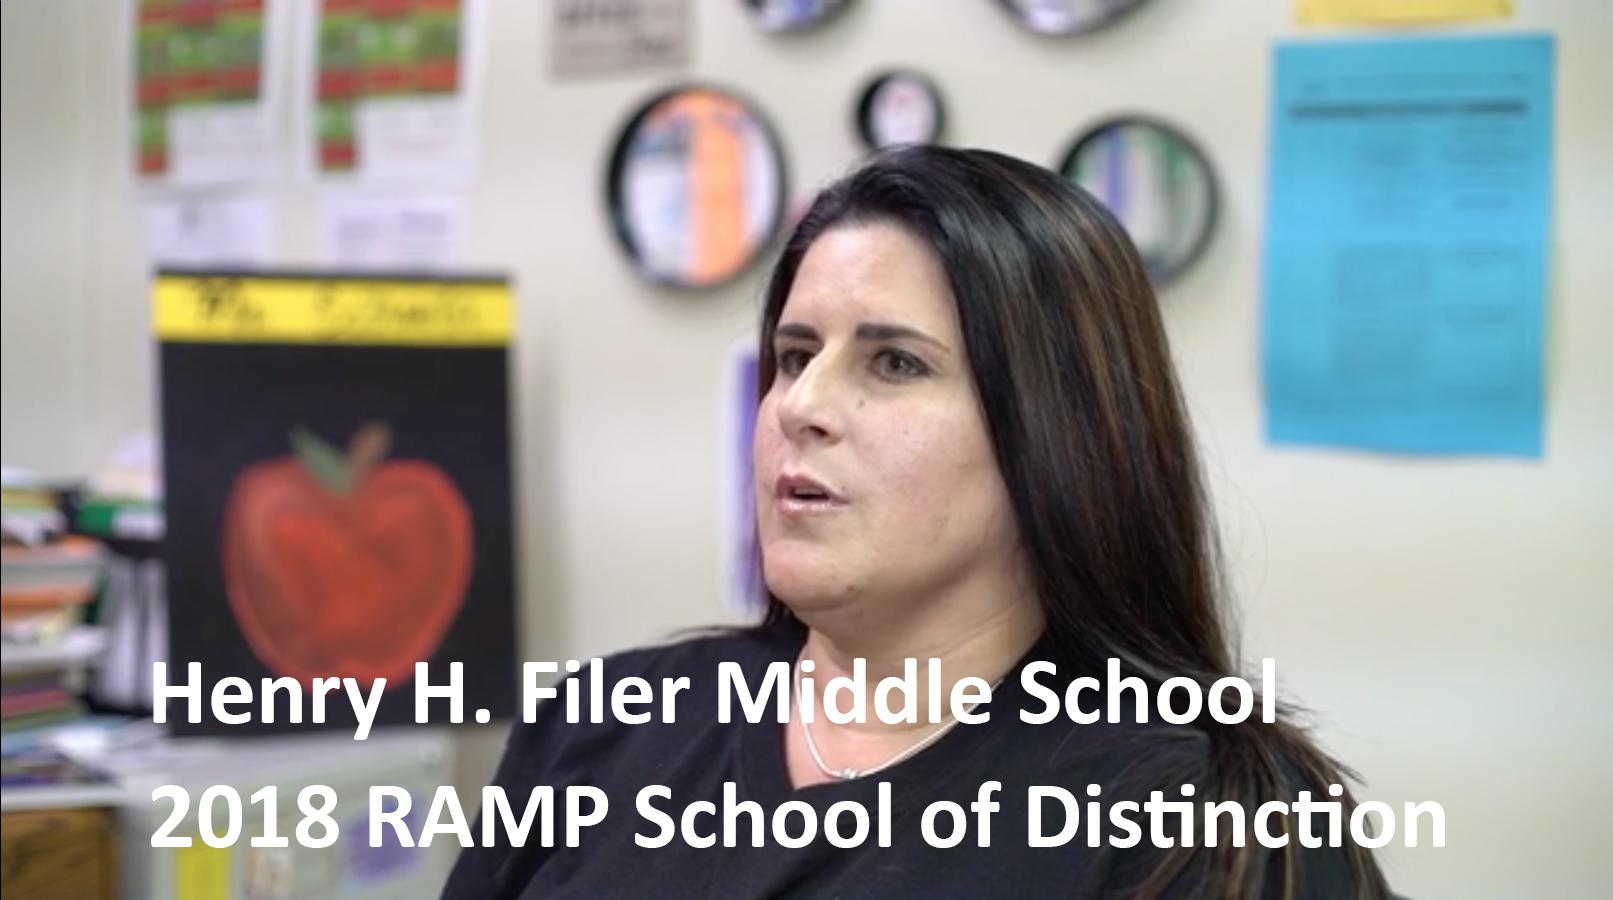 Henry H. Filer Middle School: 2018 RAMP School of Distinction